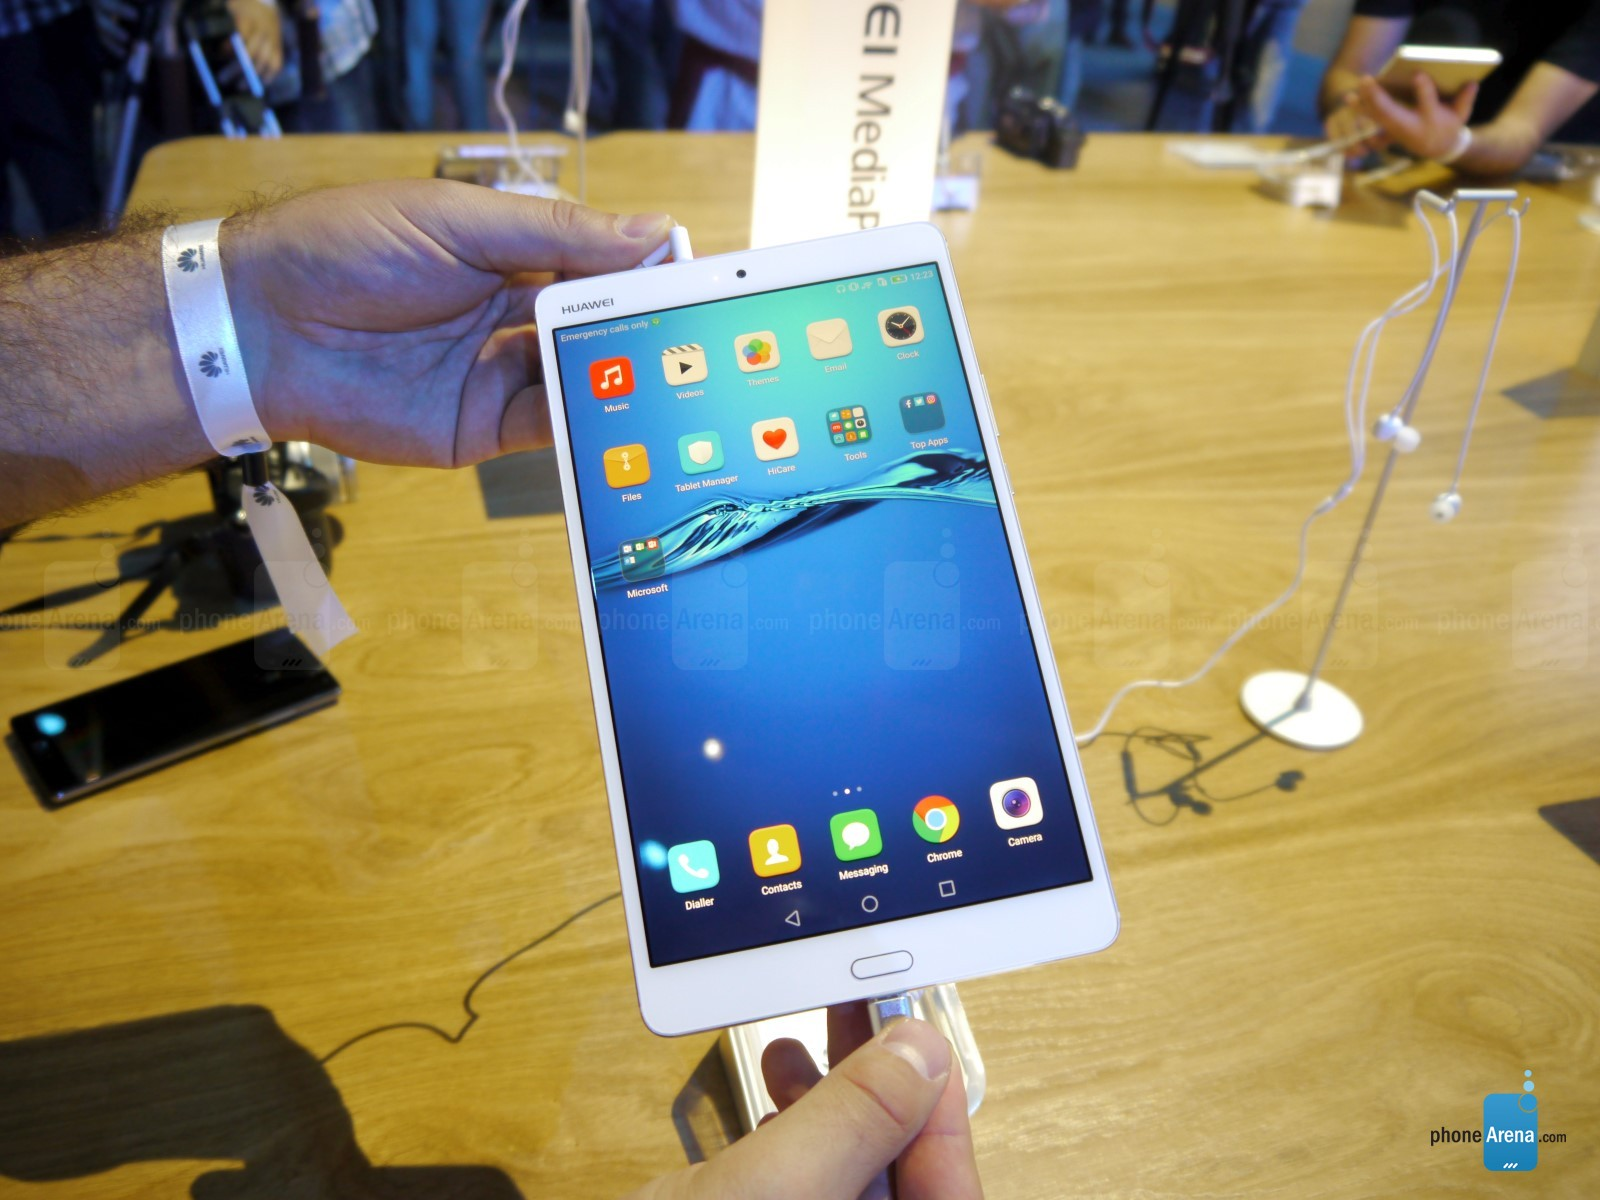 Trên tay Huawei MediaPad M3